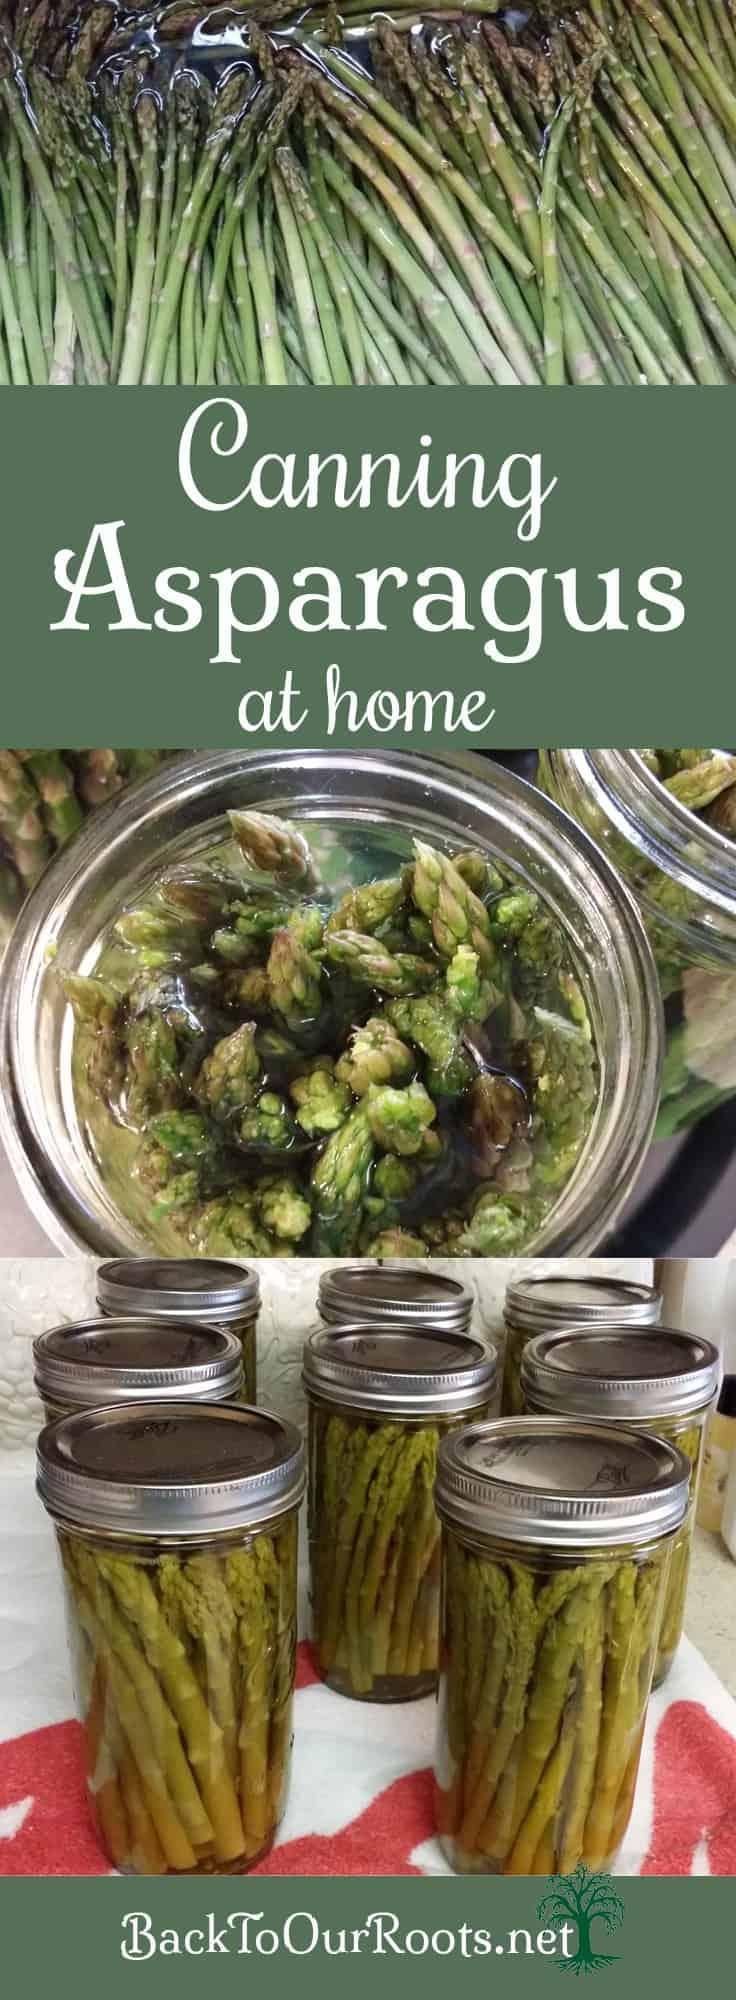 Canning Asparagus How to Can Asparagus